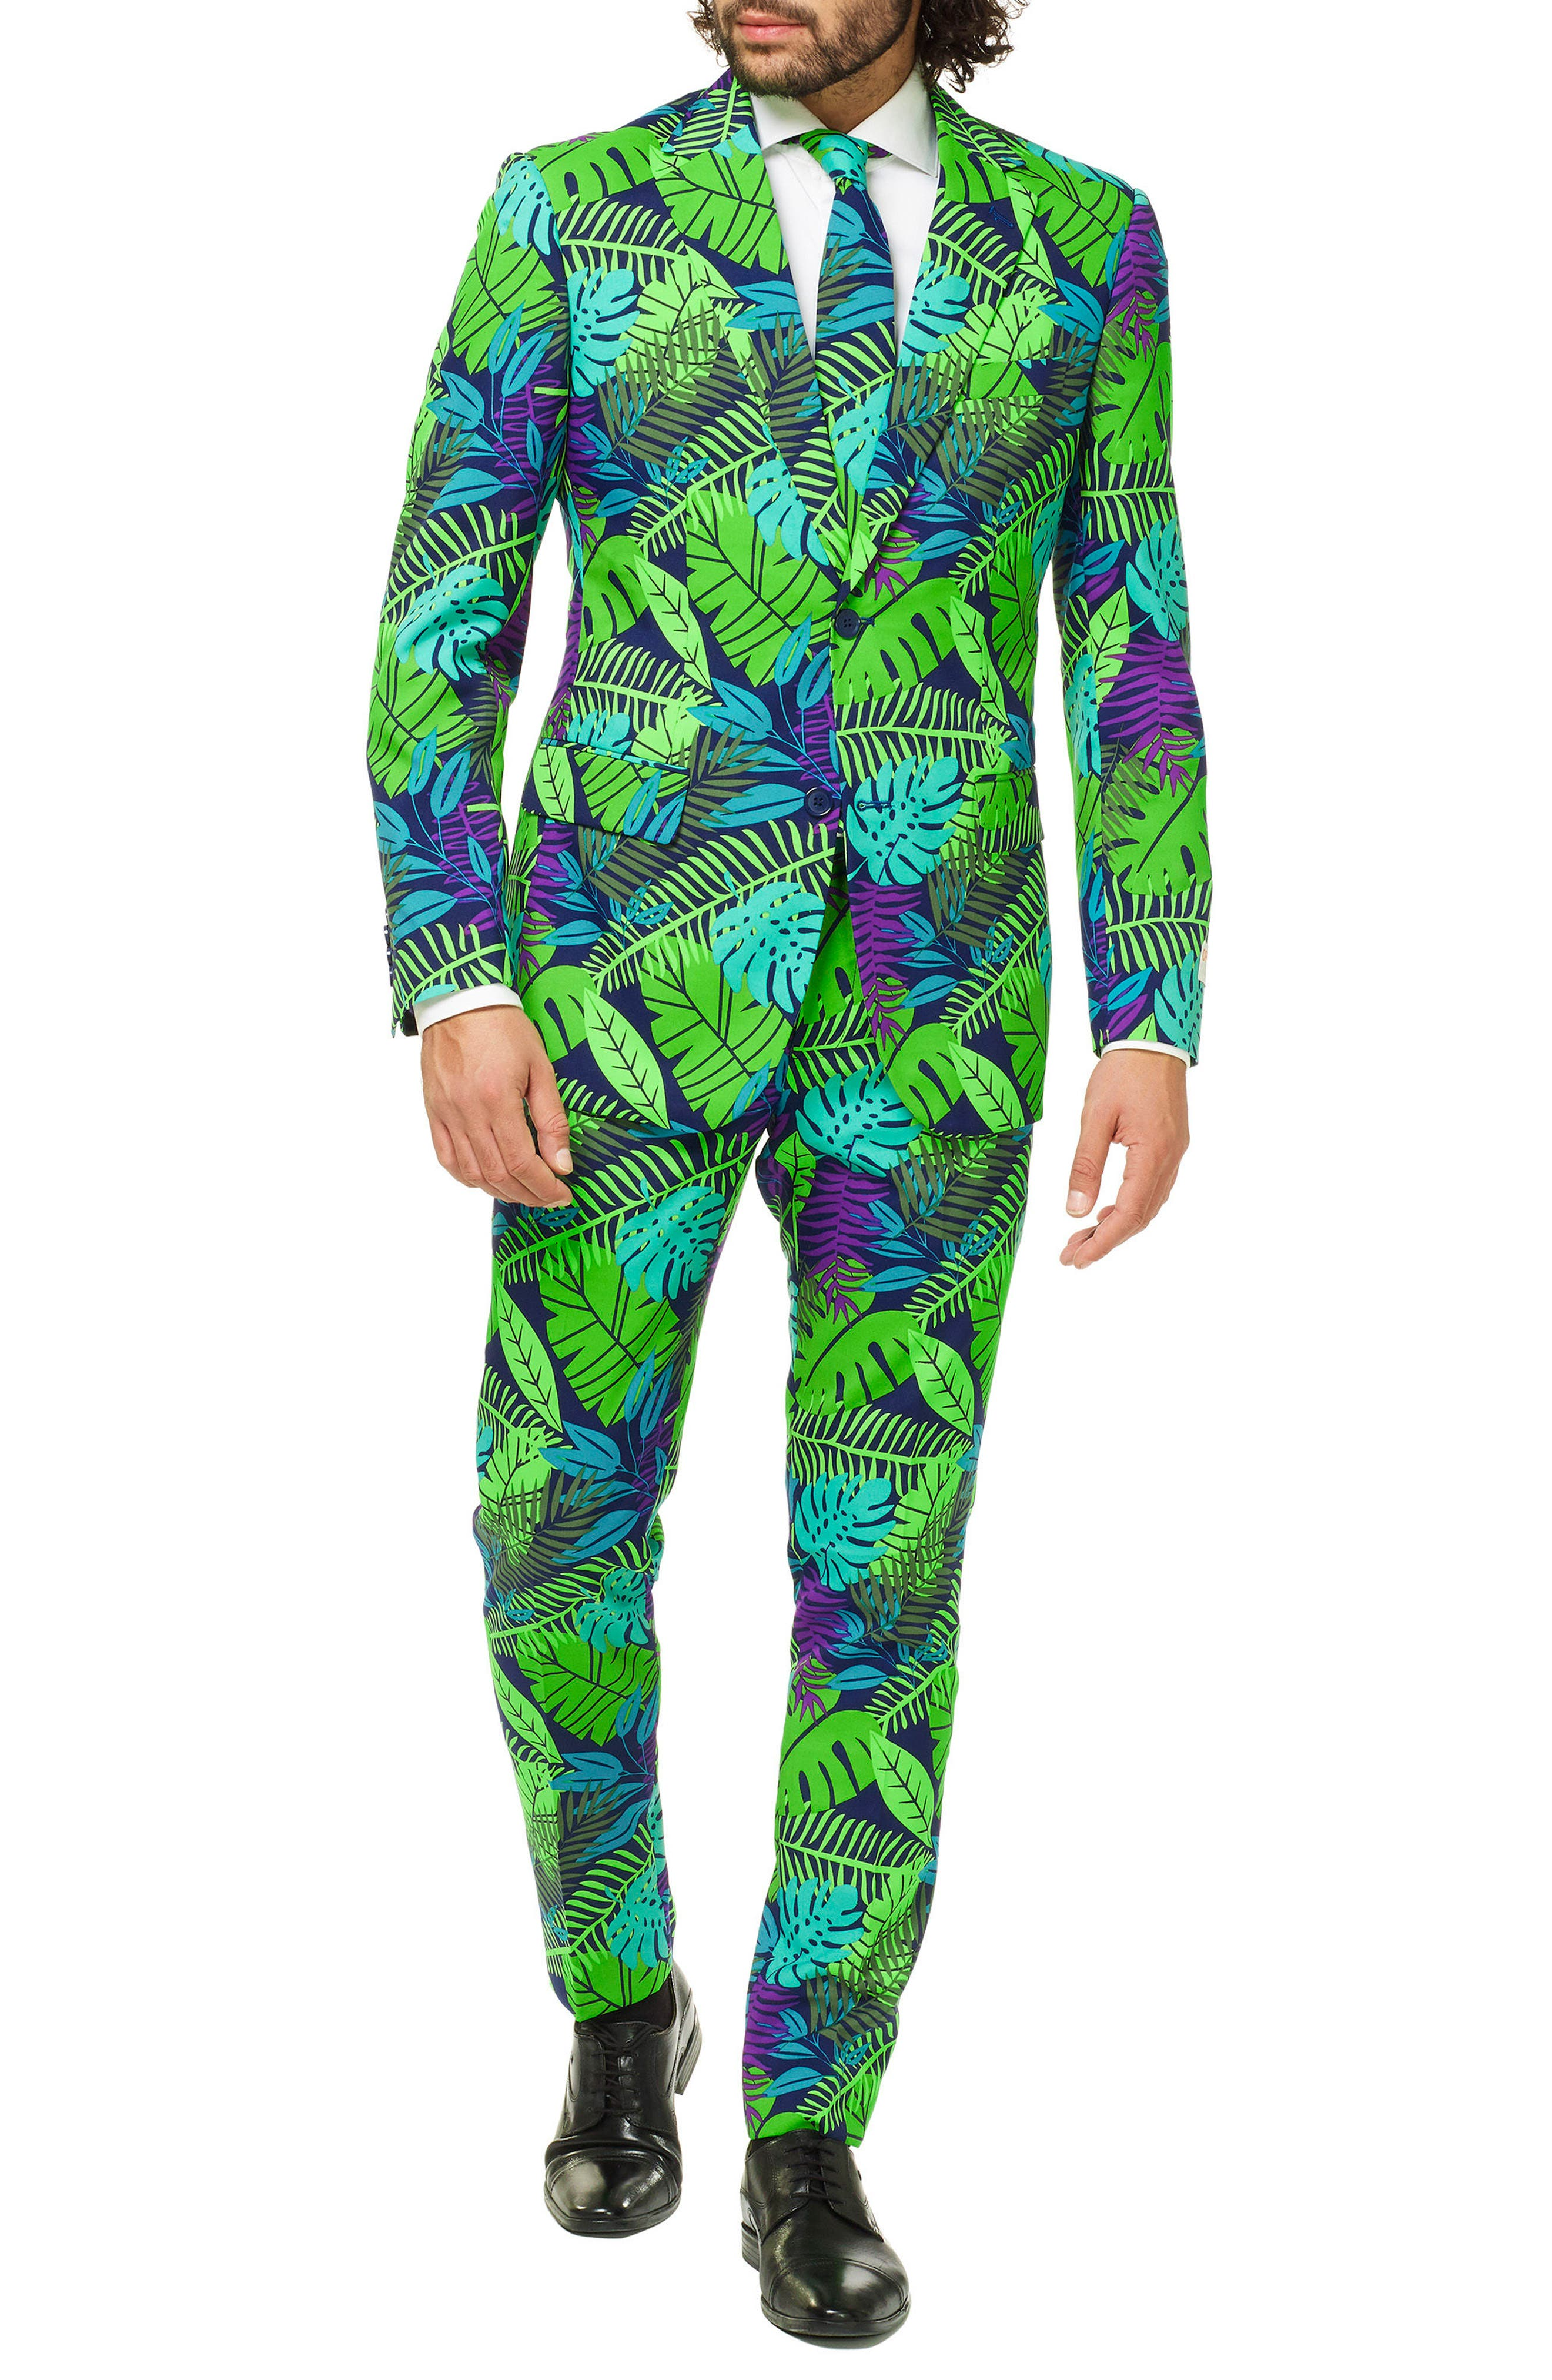 Juicy Jungle Trim Fit two-Piece Suit with Tie,                             Main thumbnail 1, color,                             MISCELLANEOUS